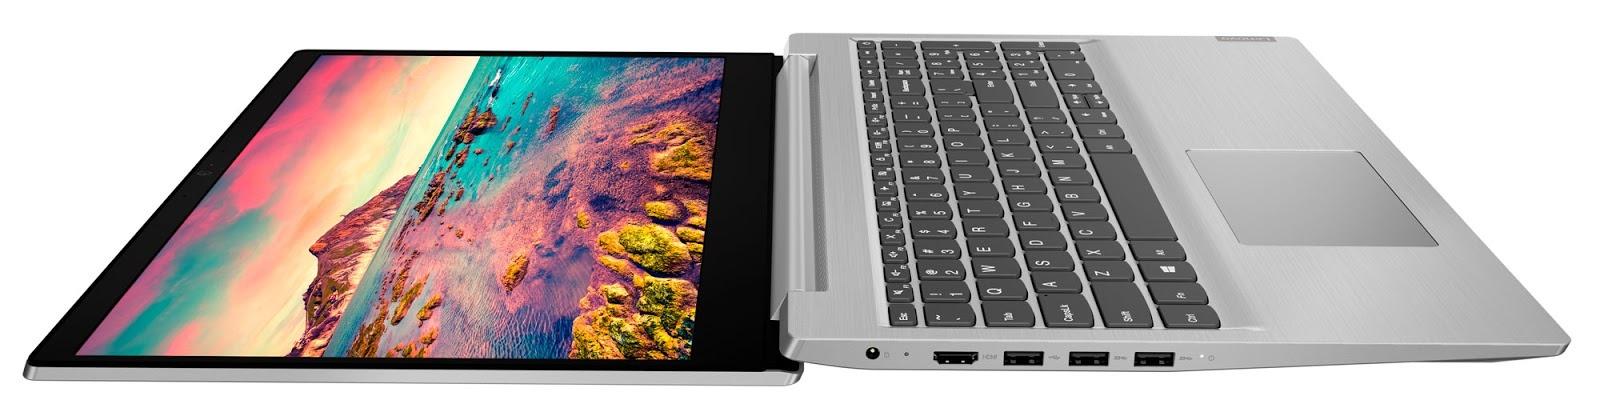 Фото 4. Ноутбук Lenovo ideapad S145-15IGM Grey (81MX001JRE)